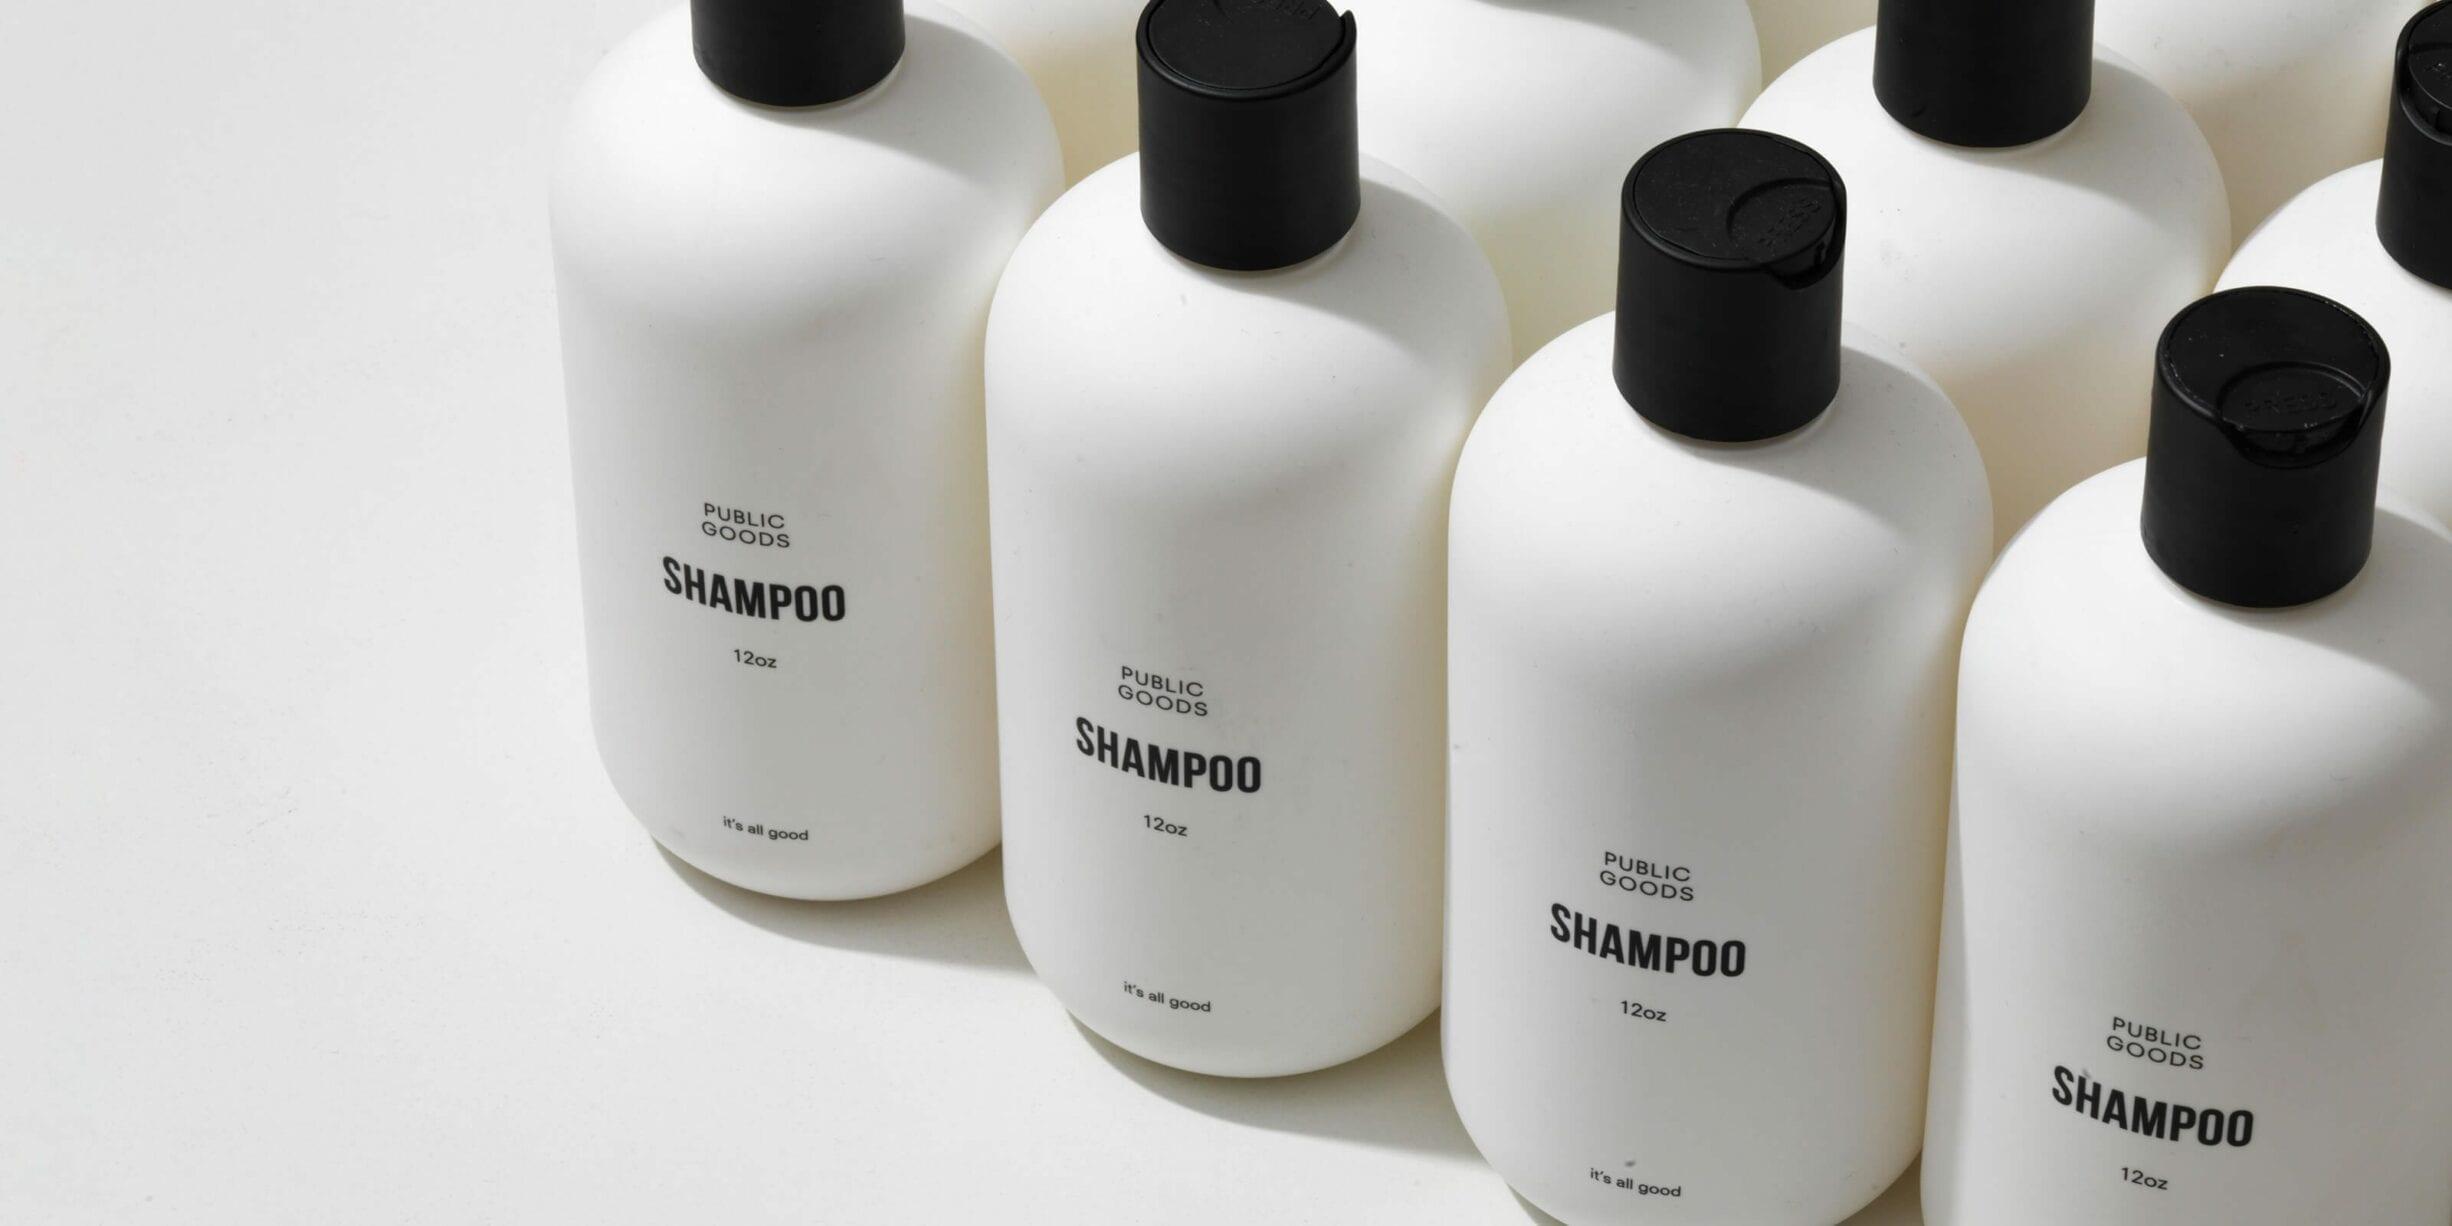 bottles of public goods shampoo